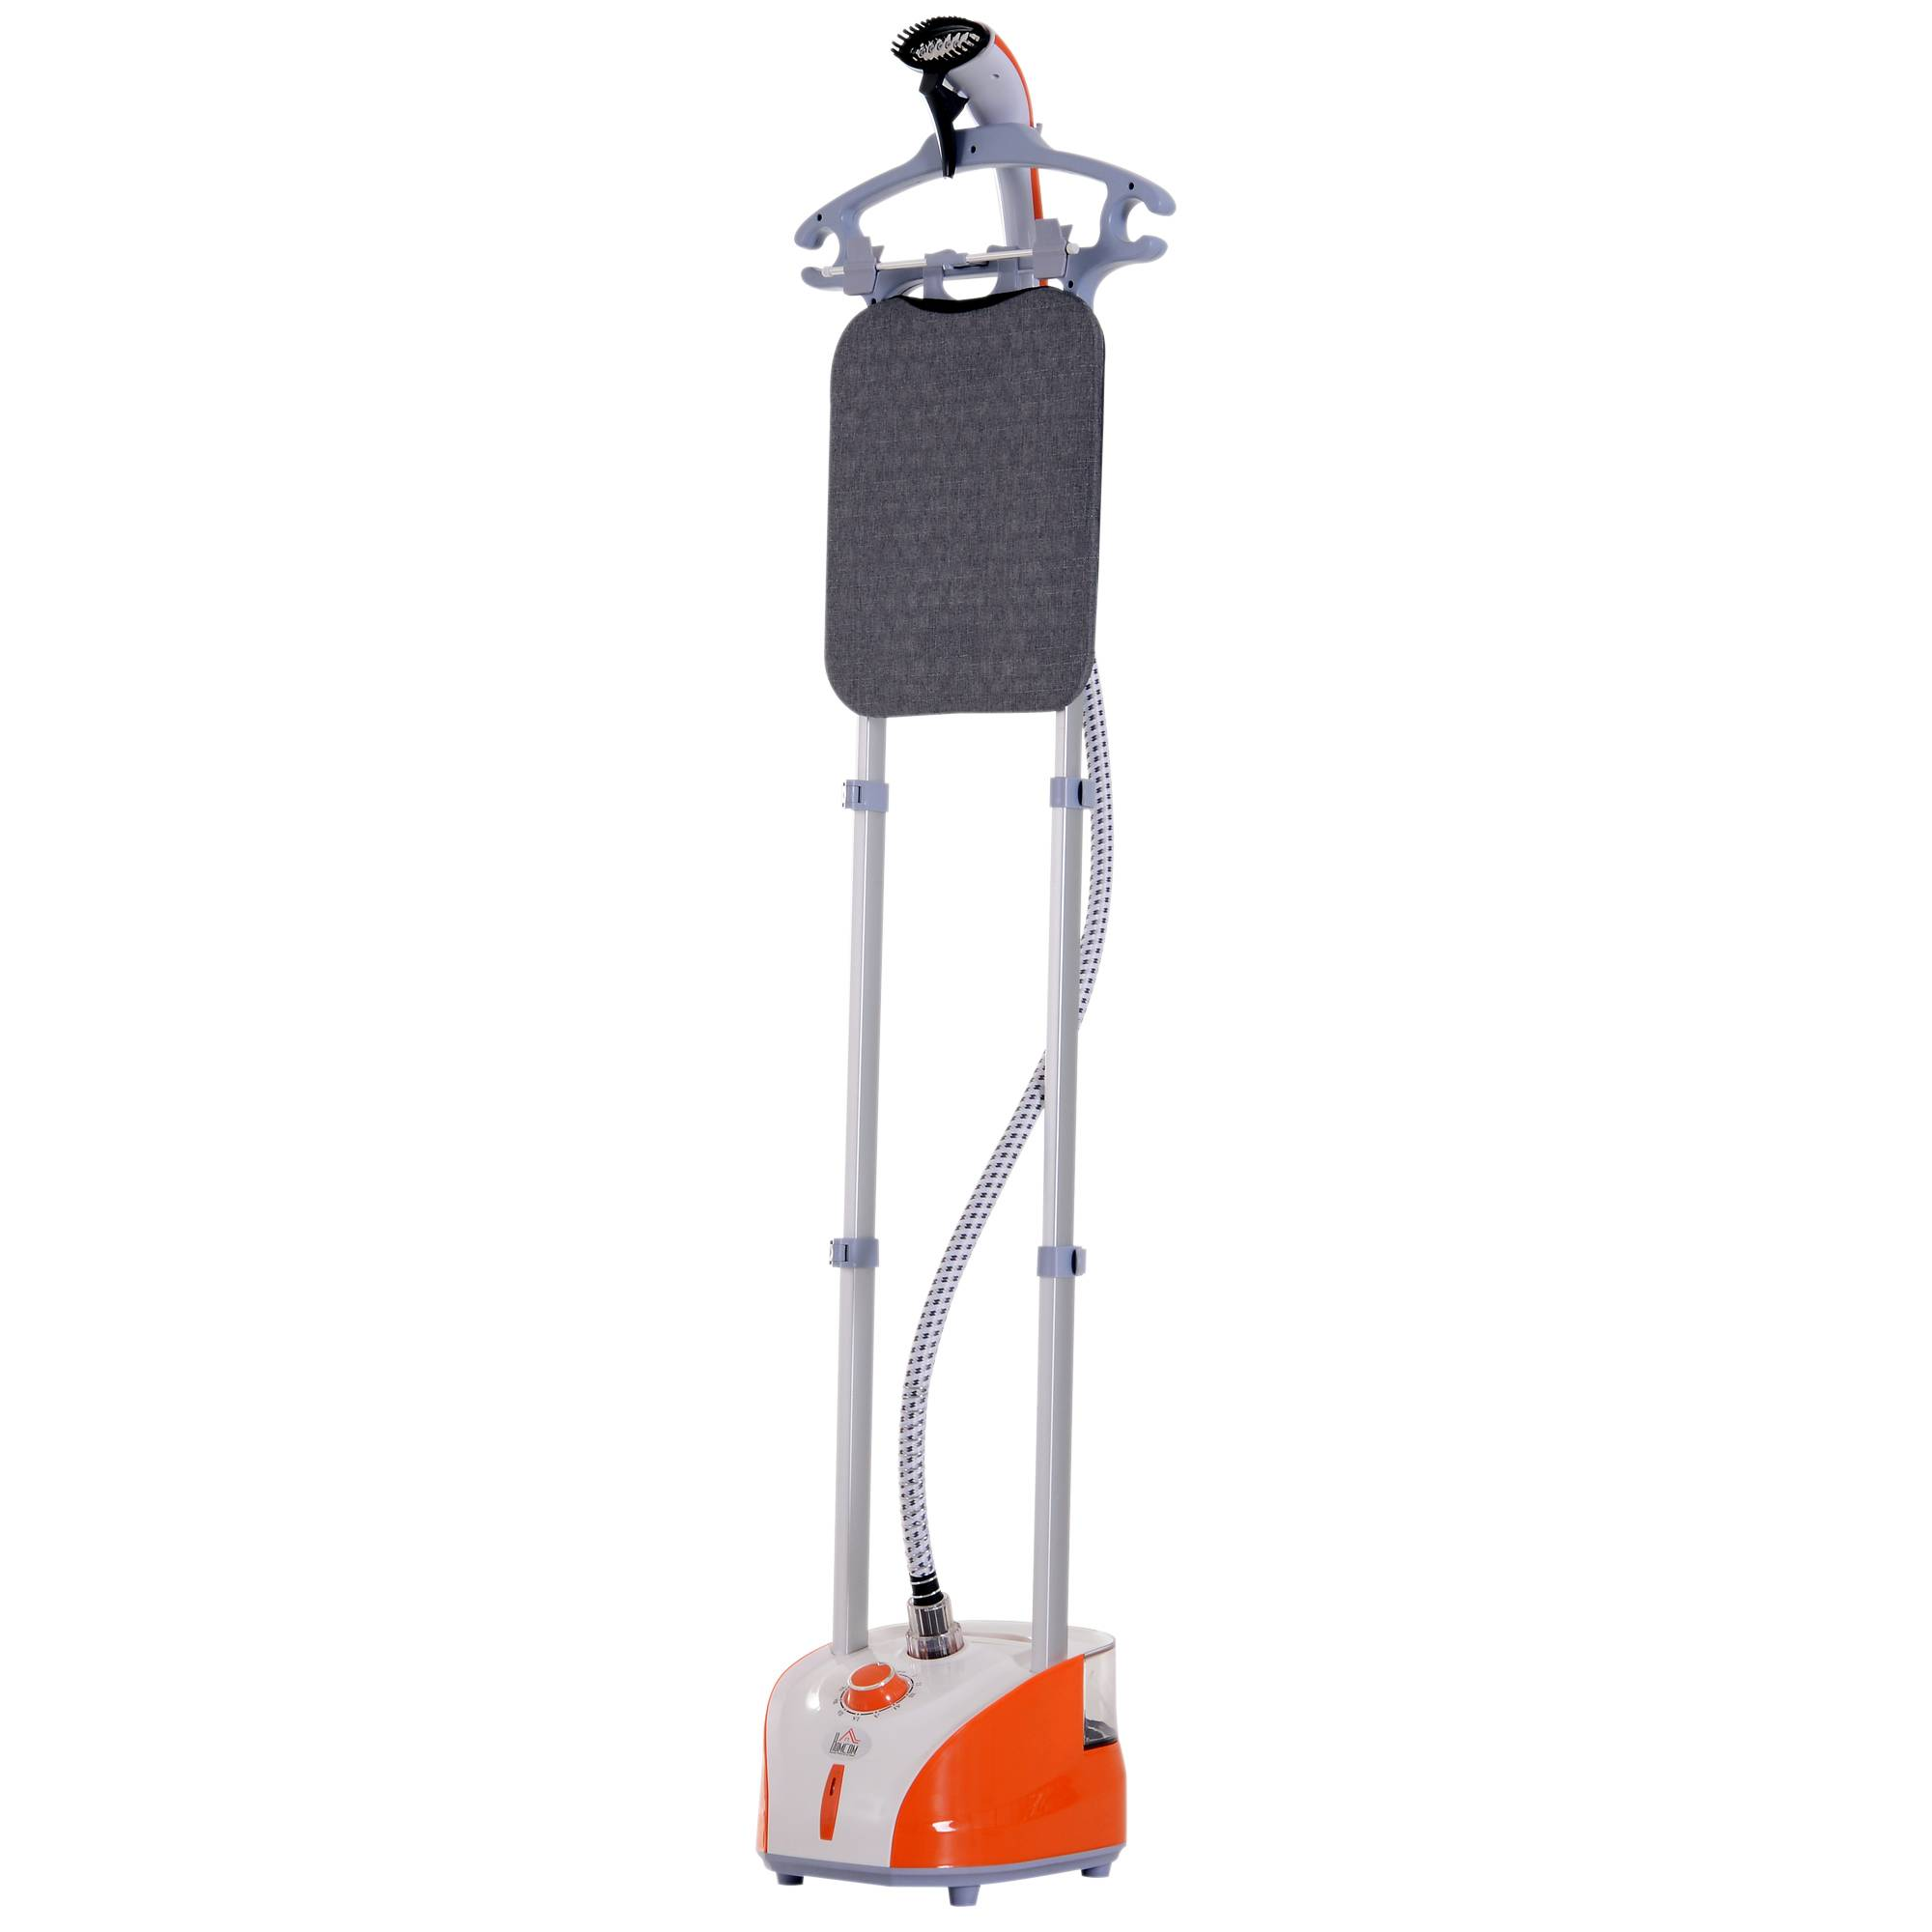 Homcom Stiratrice a Vapore Verticale Capacità 2L, Arancione e Grigio